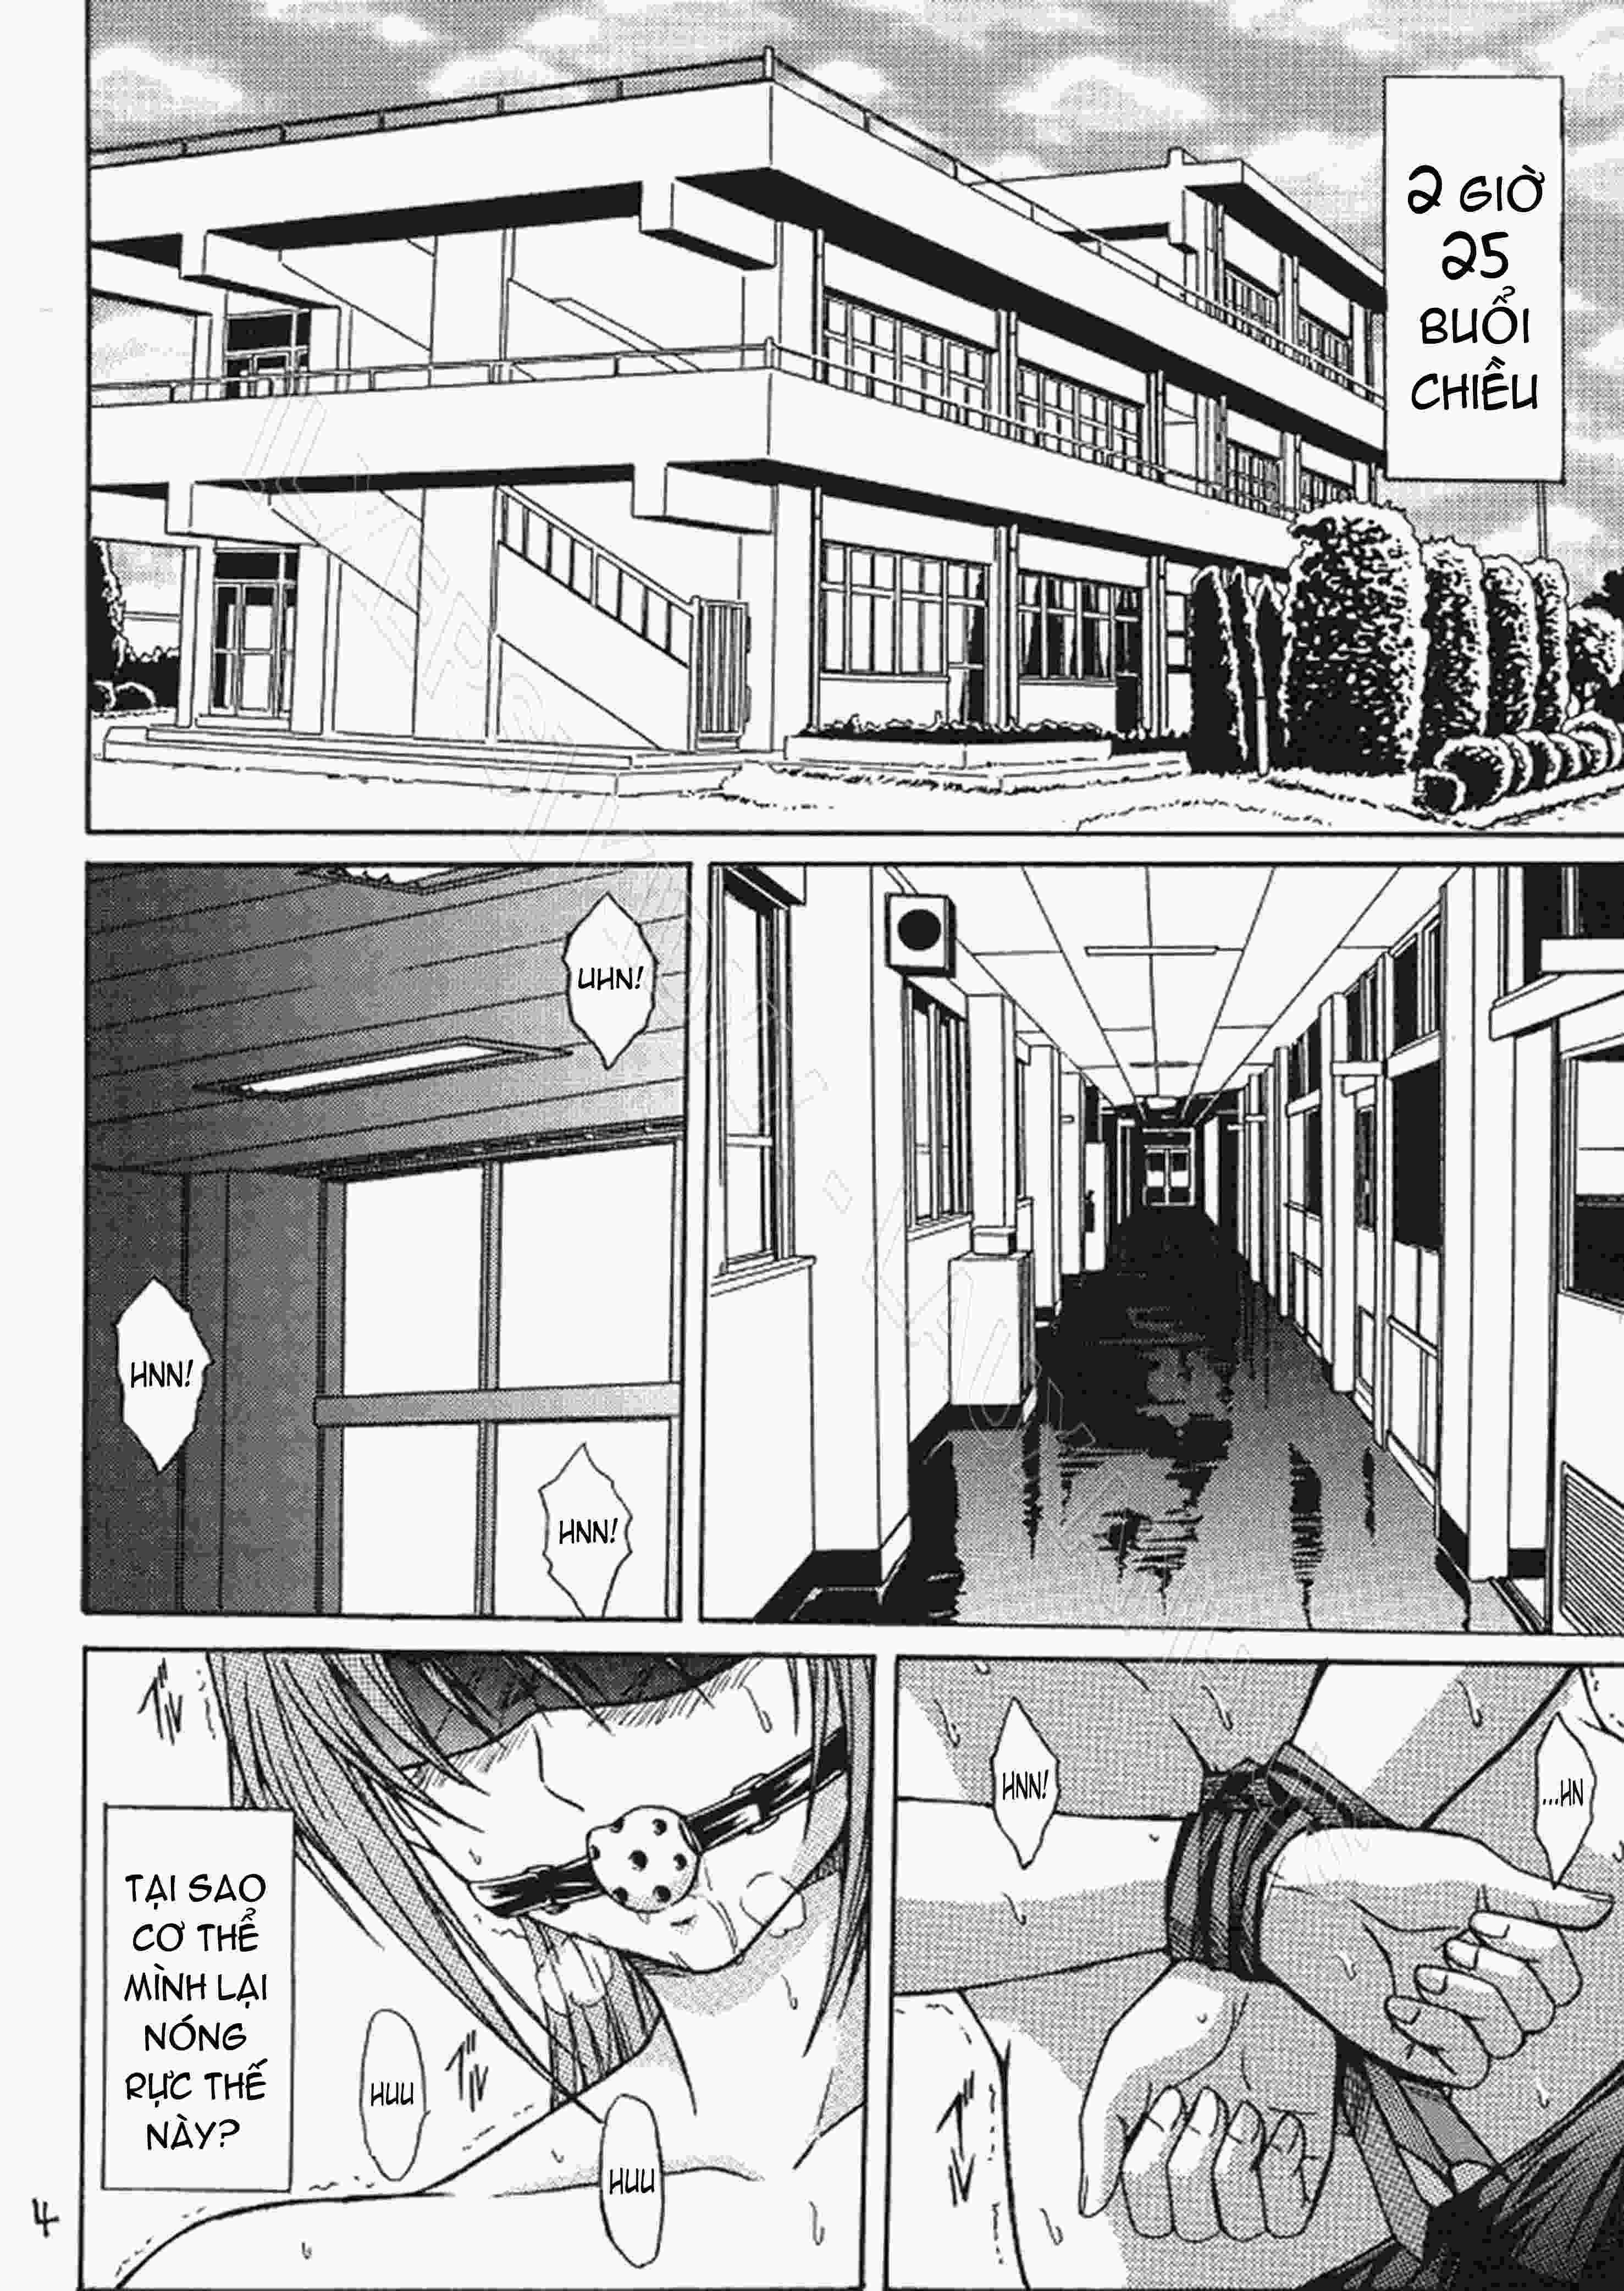 TruyenHay.Com - Ảnh 3 - Ryoujoku Rensa Chapter 1